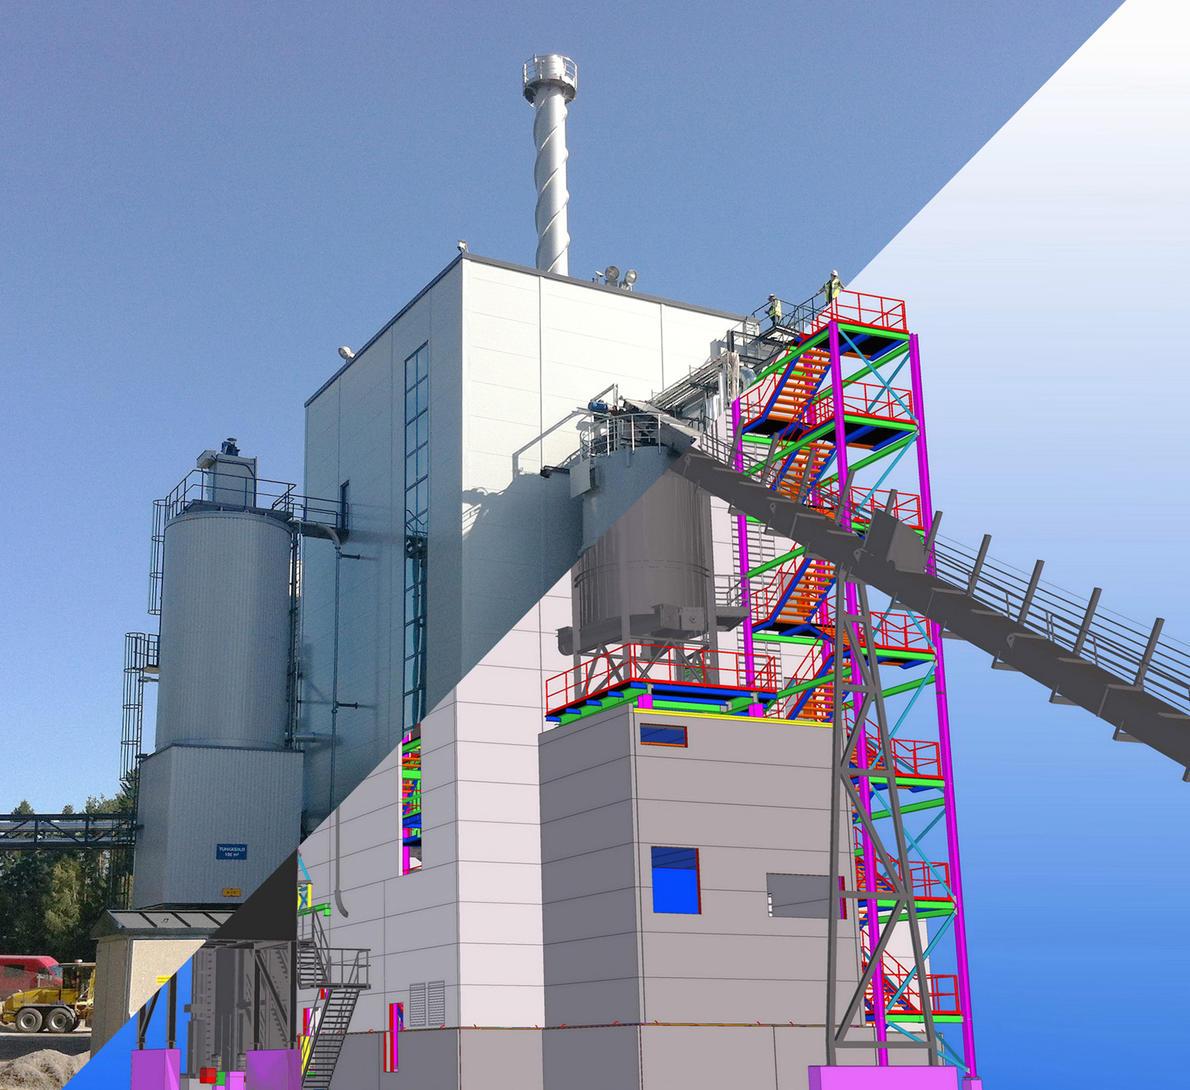 2014-04-jepua_waste-to-energy-plant.jpg